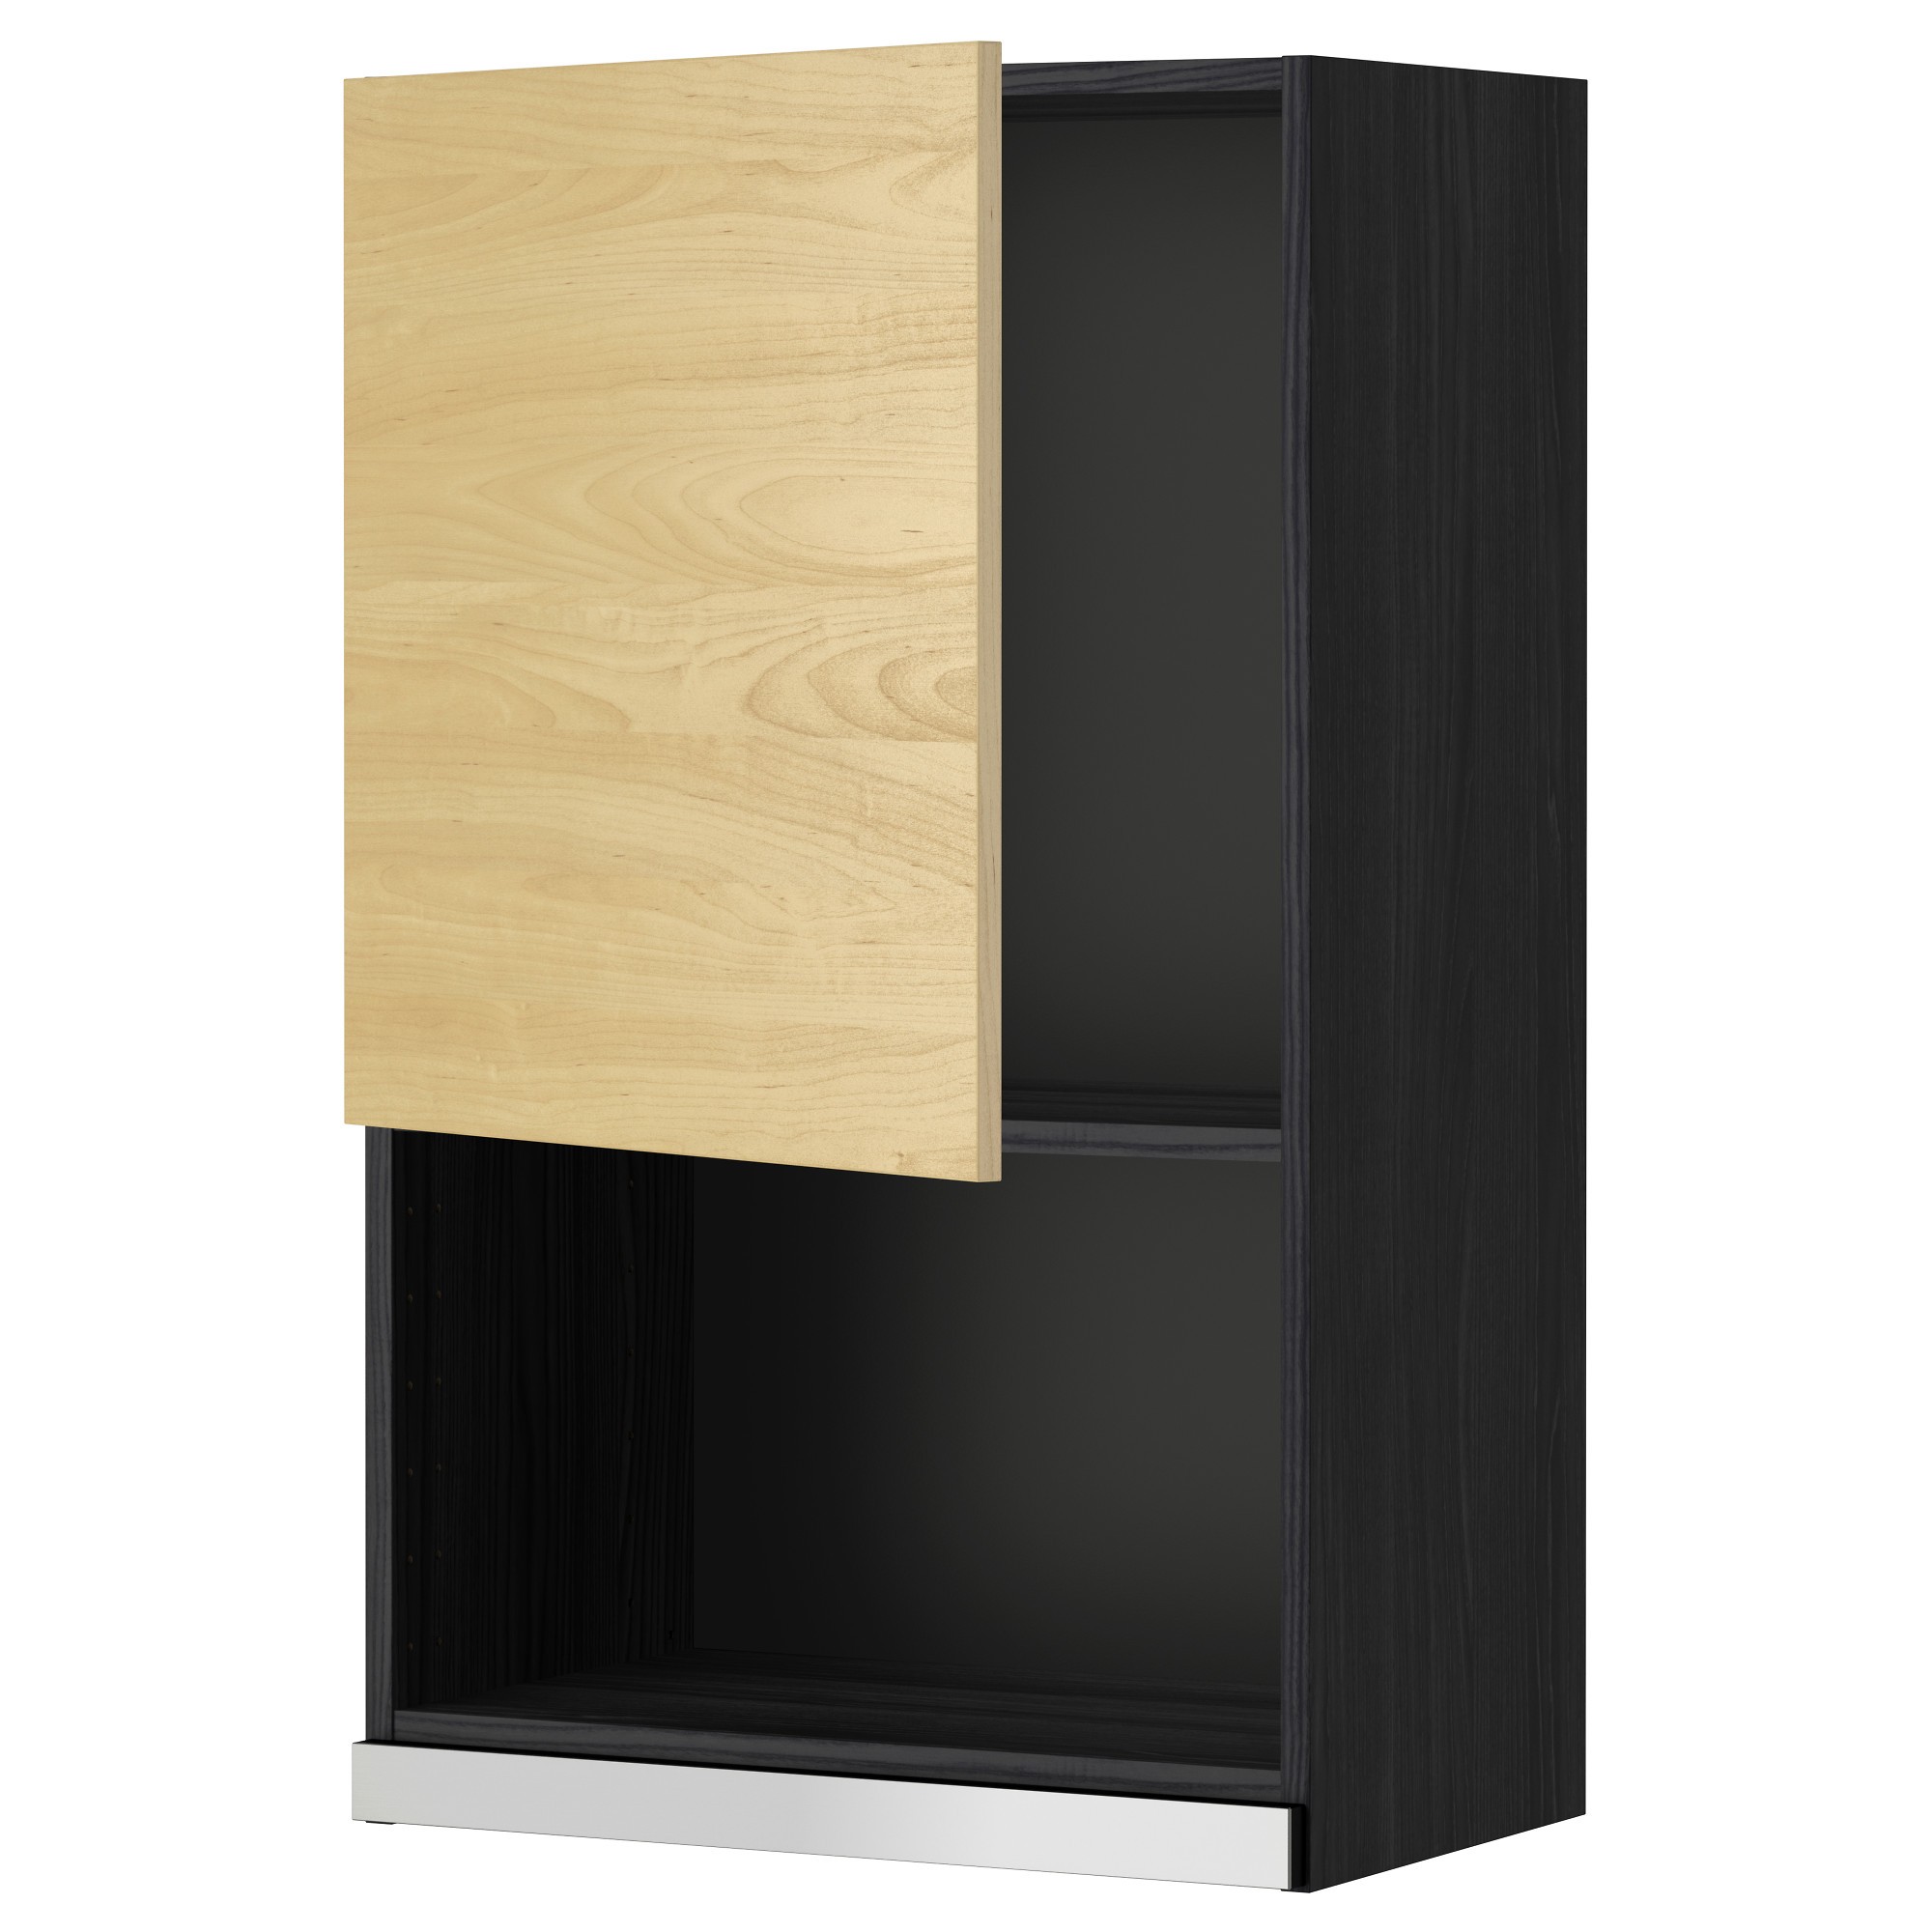 сборка икеа шкаф